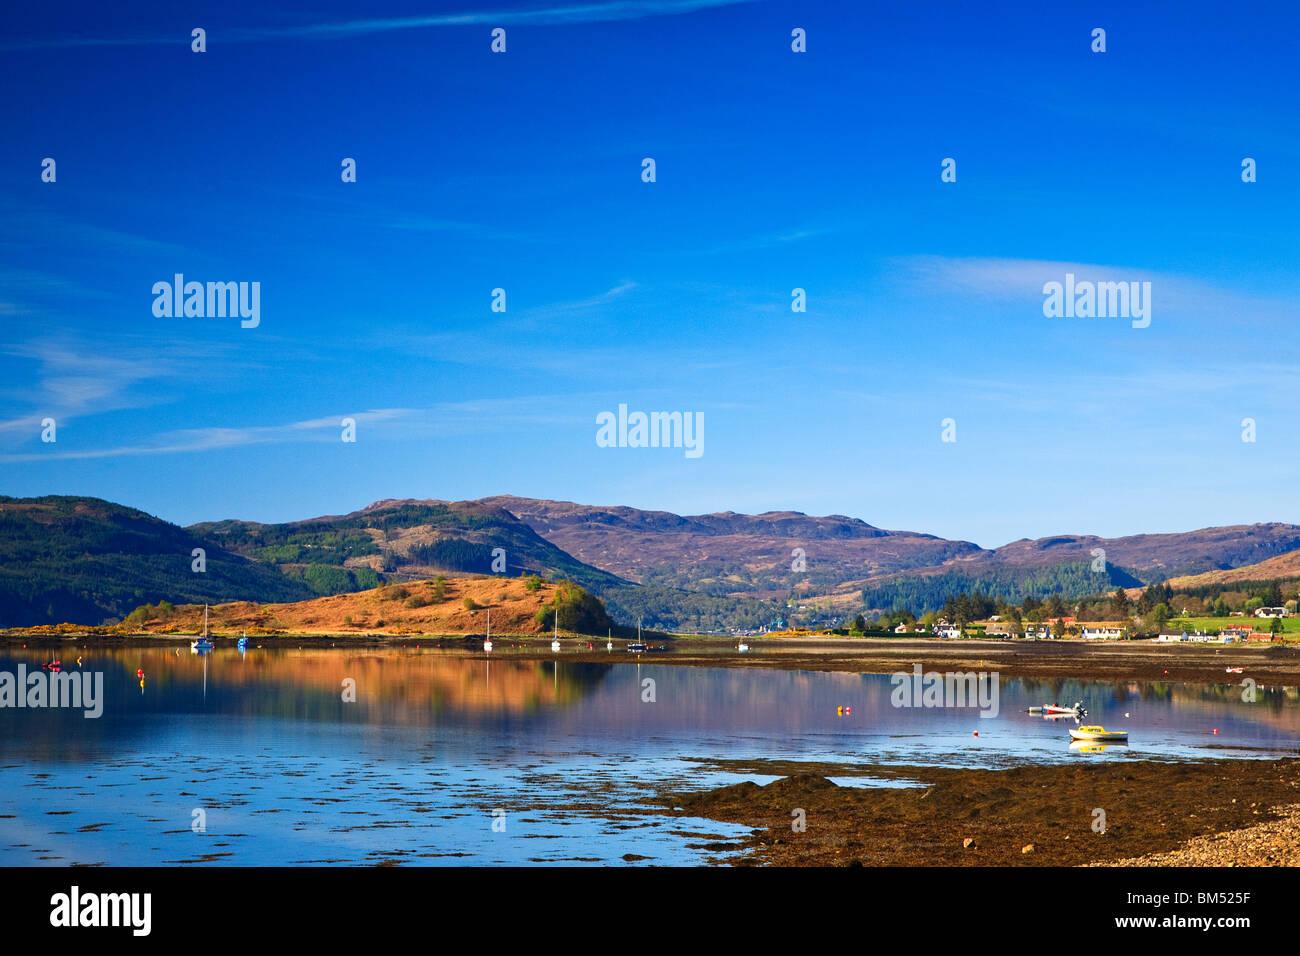 Loch carron, Wester Ross Scotland West coast Highlands Great Britain UK 2010 - Stock Image